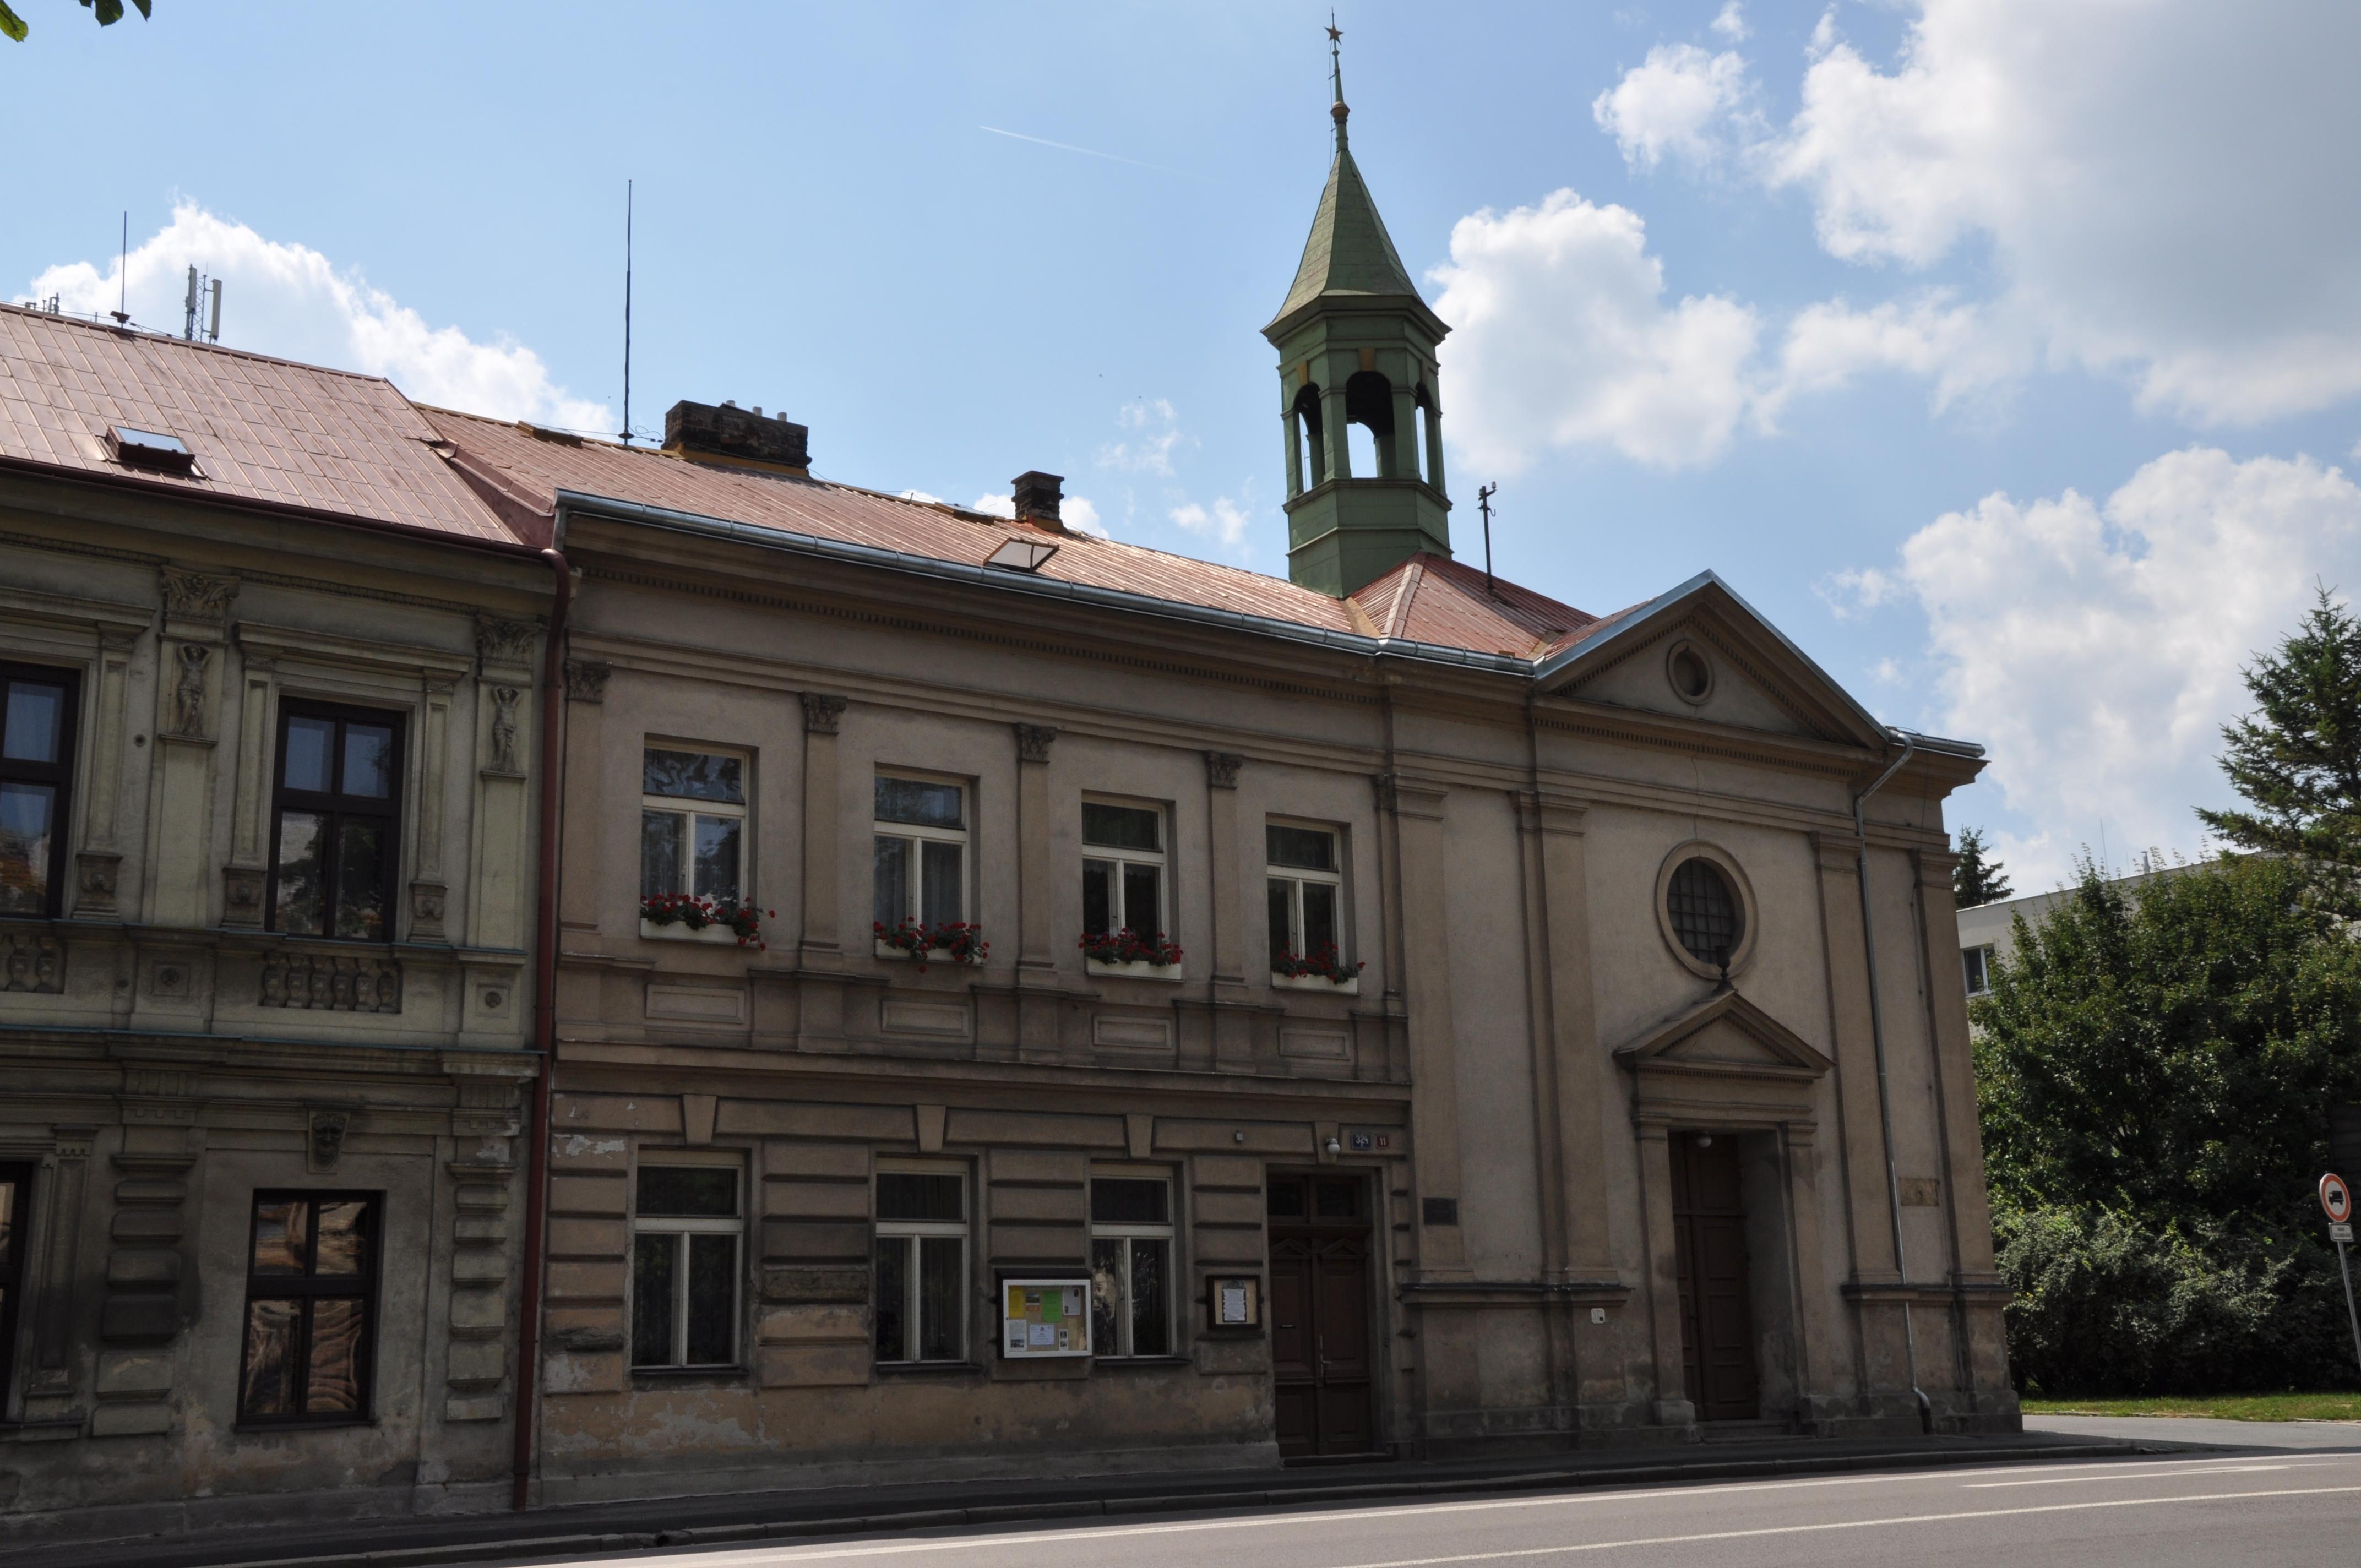 File:Chrudim-evang-kostel2013.jpg - Wikimedia Commons